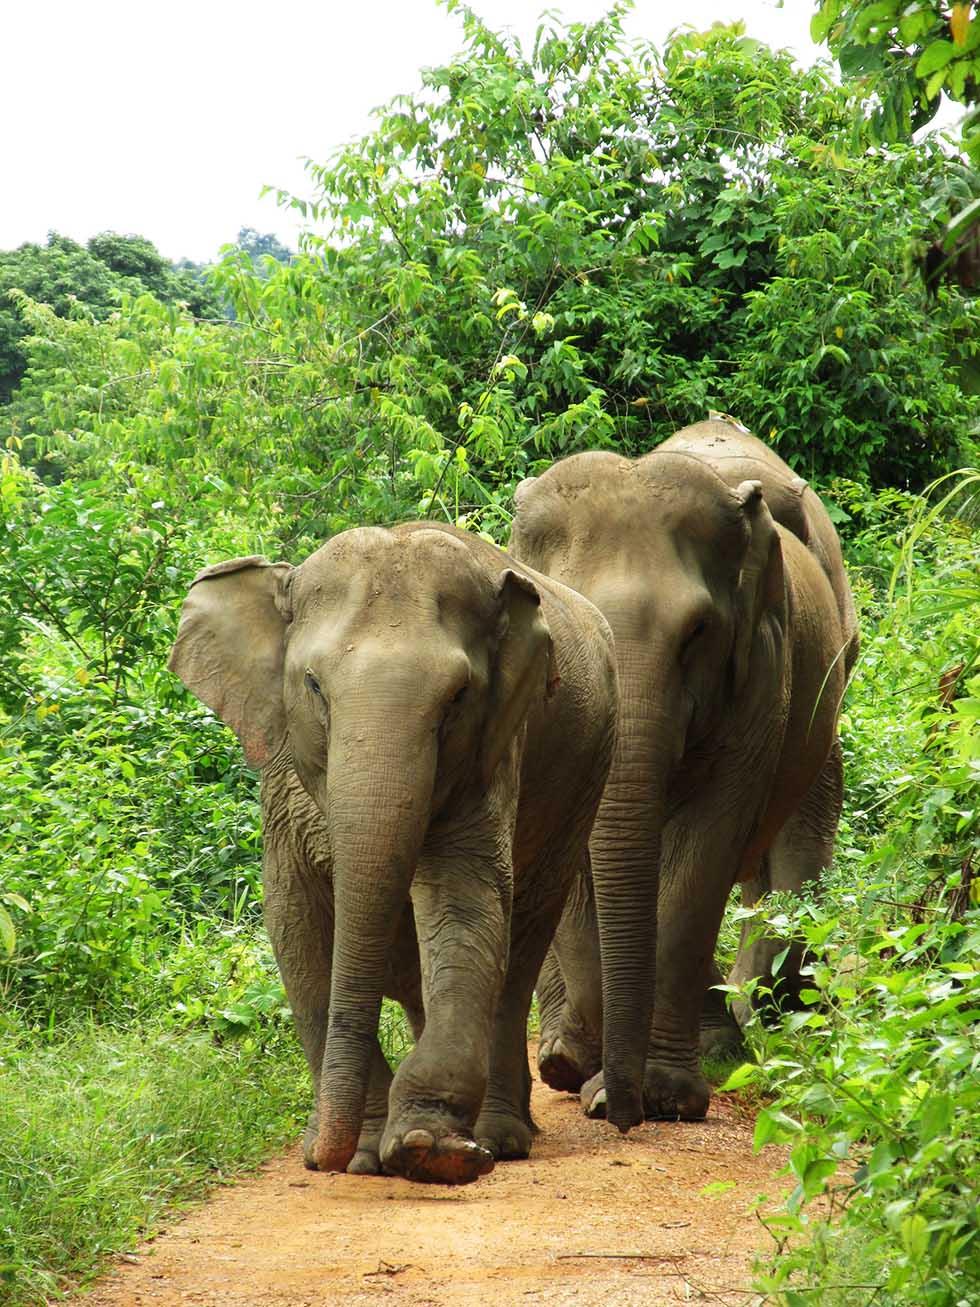 Lott's Elephant Sanctuary